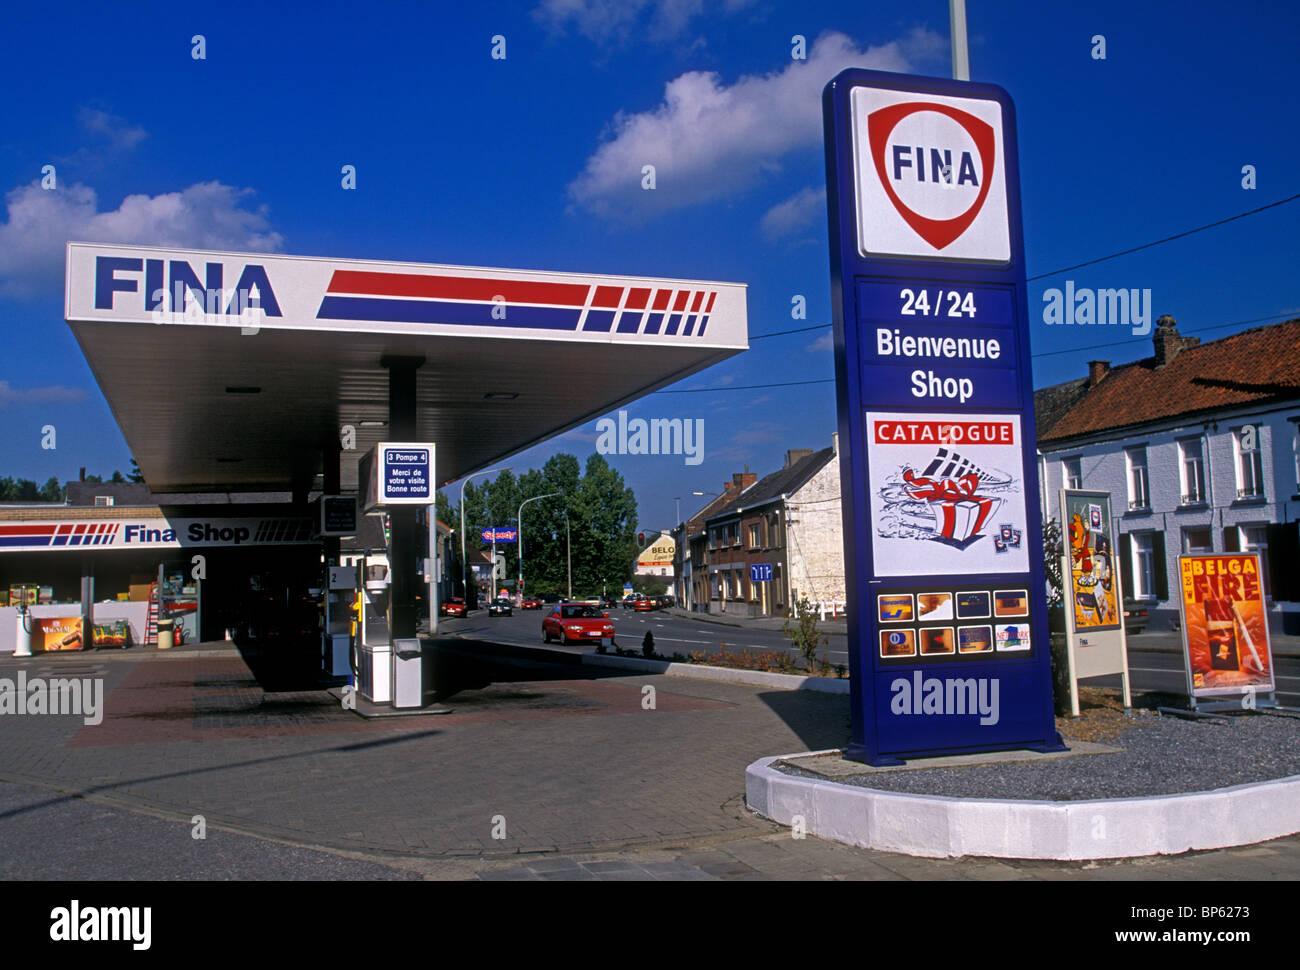 station d 39 essence fina ville de nimy r gion wallonne belgique europe banque d 39 images photo. Black Bedroom Furniture Sets. Home Design Ideas